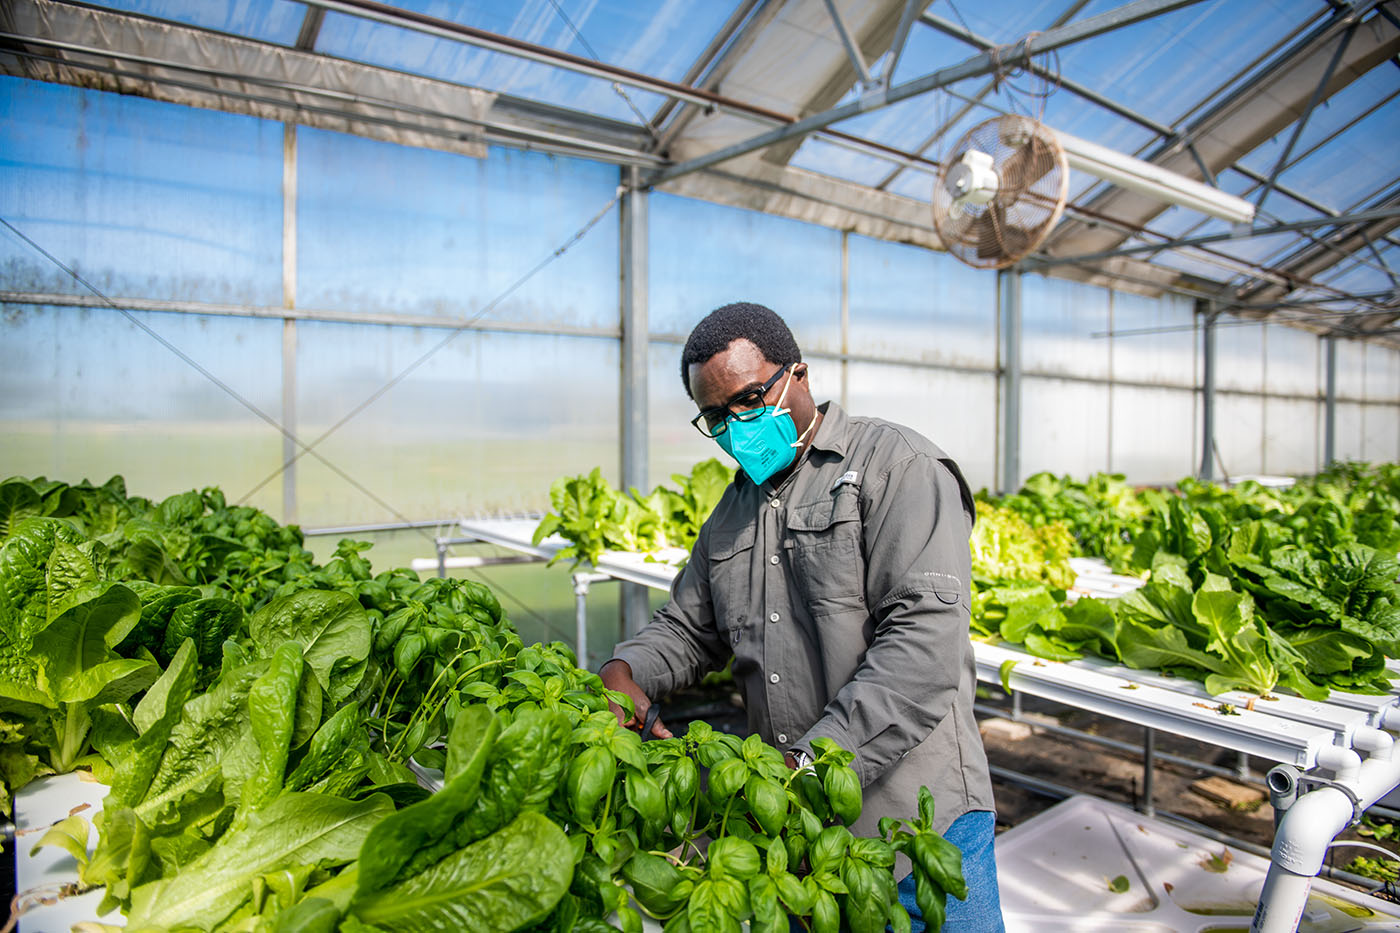 M21063-Greenhouse-Lettuce-Harvesting-6937